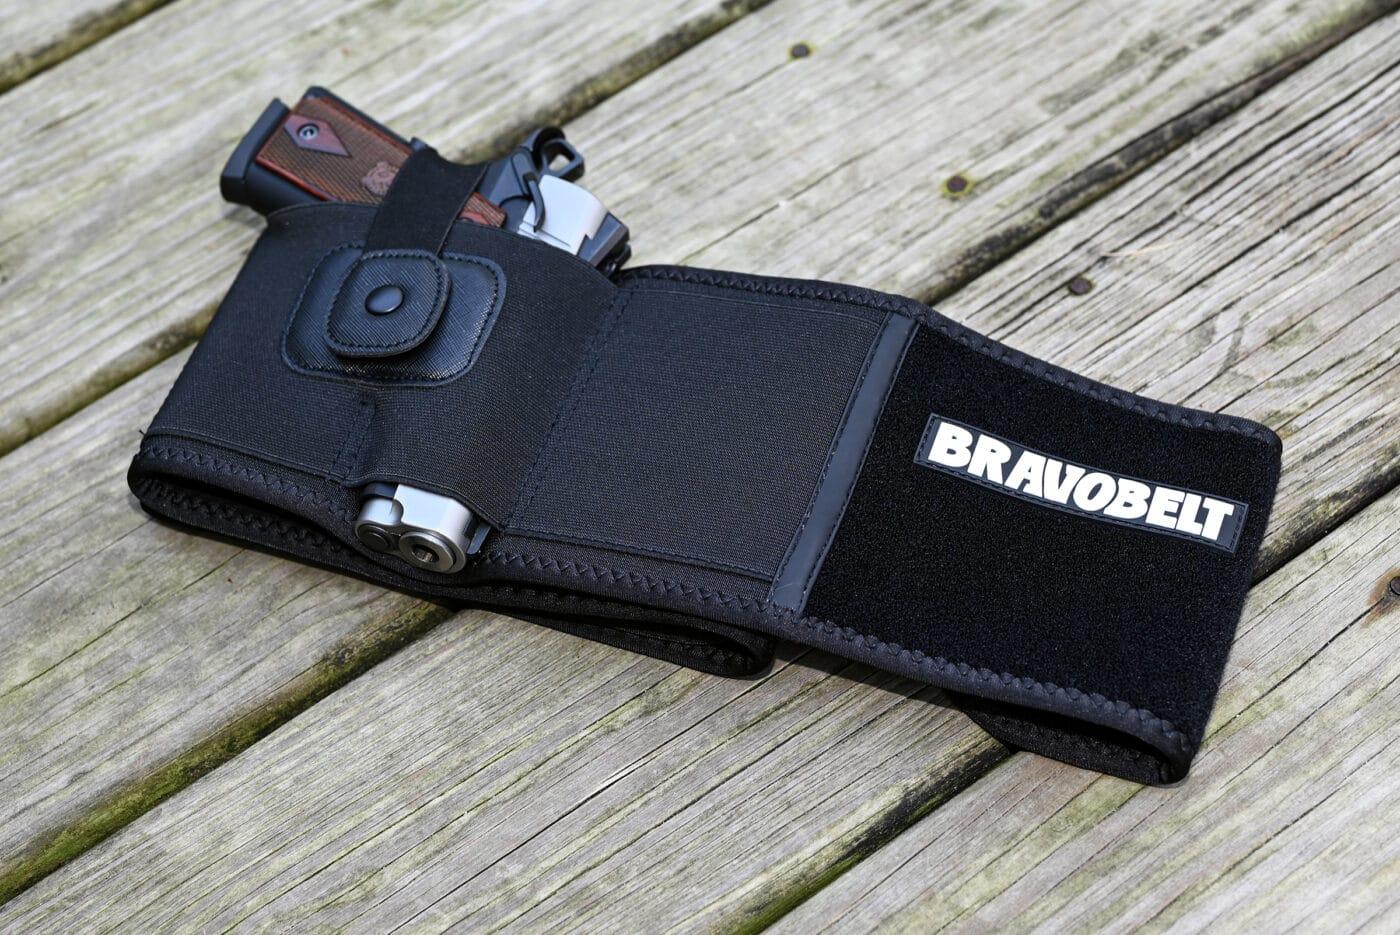 Bravo Belt with EMP pistol in it